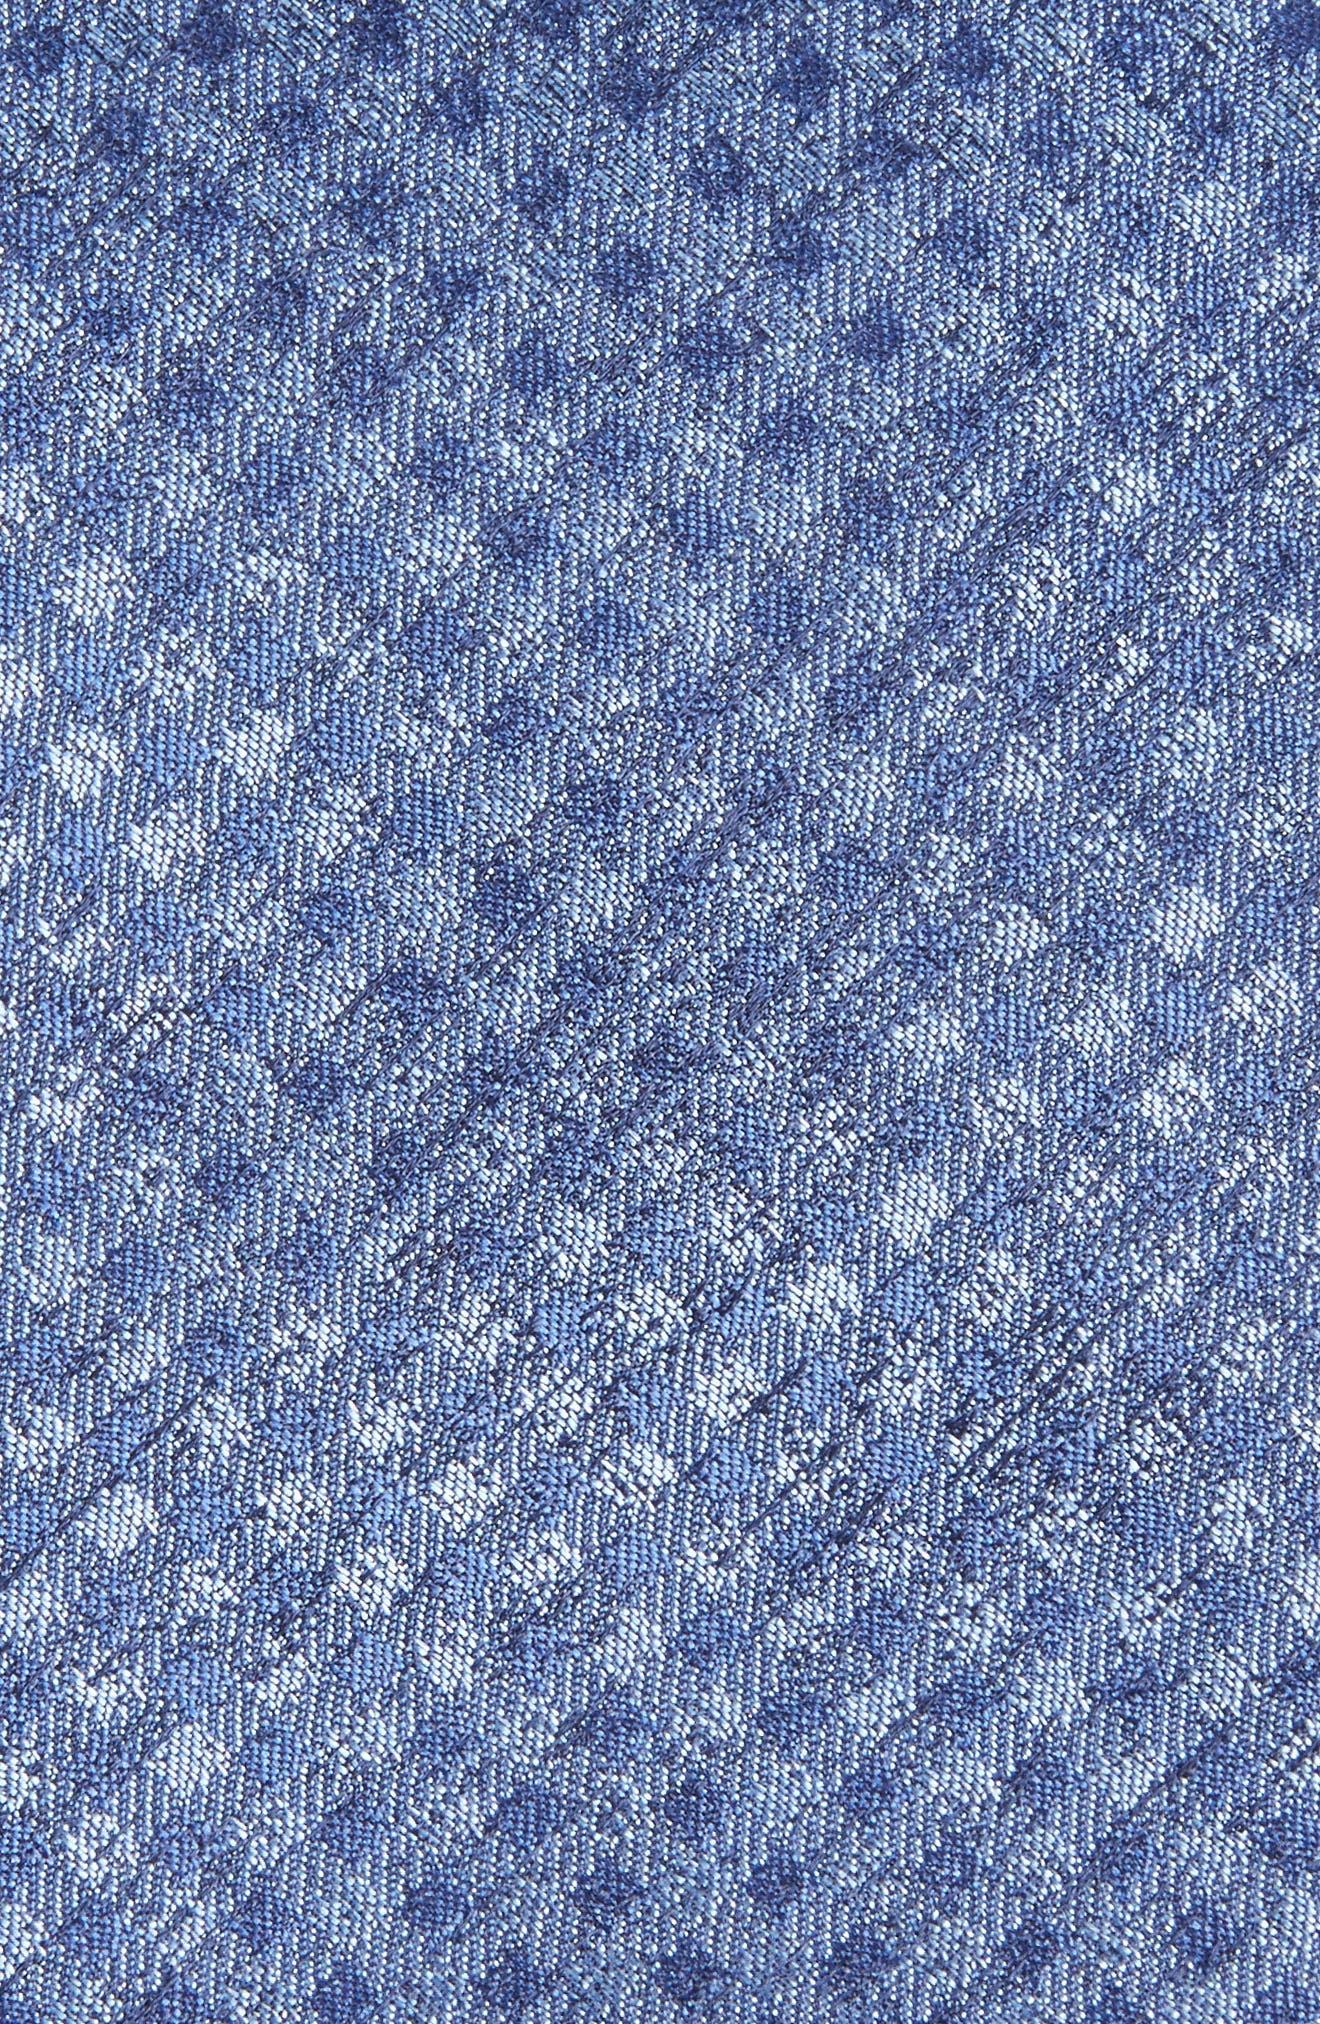 Porter Check Silk Tie,                             Alternate thumbnail 2, color,                             400